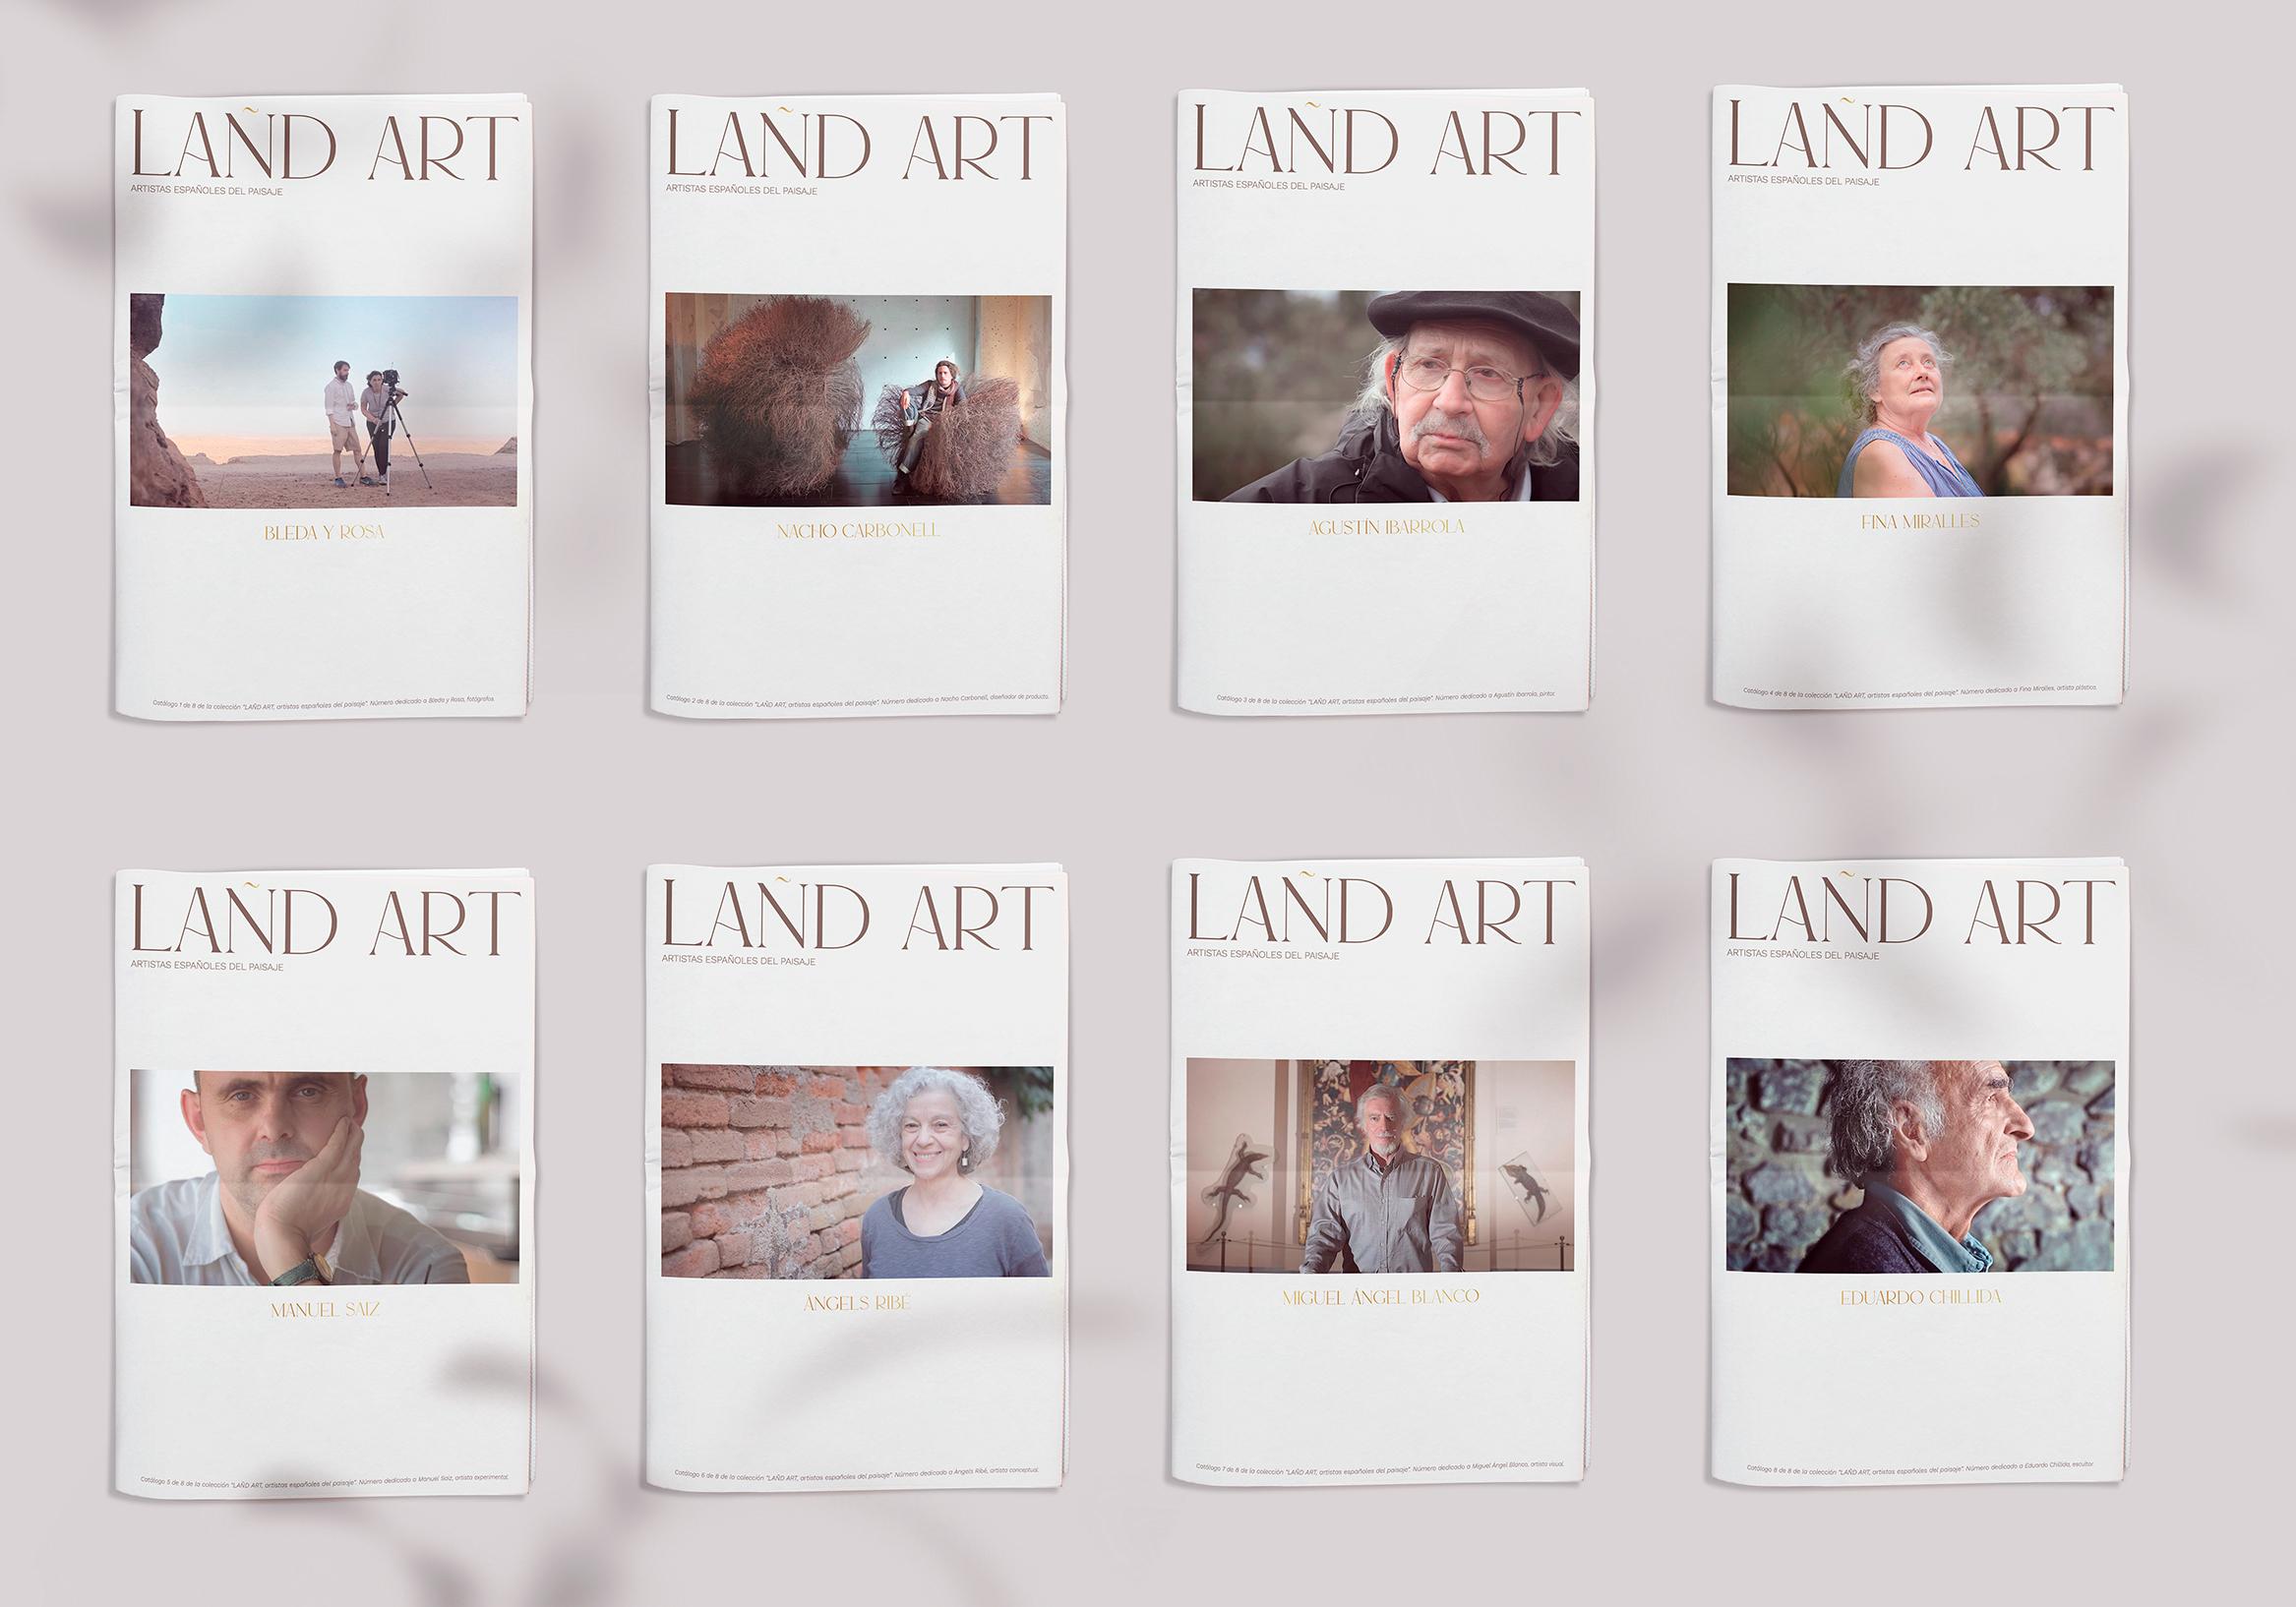 LAÑD ART by Leyre Chordá - Creative Work - $i